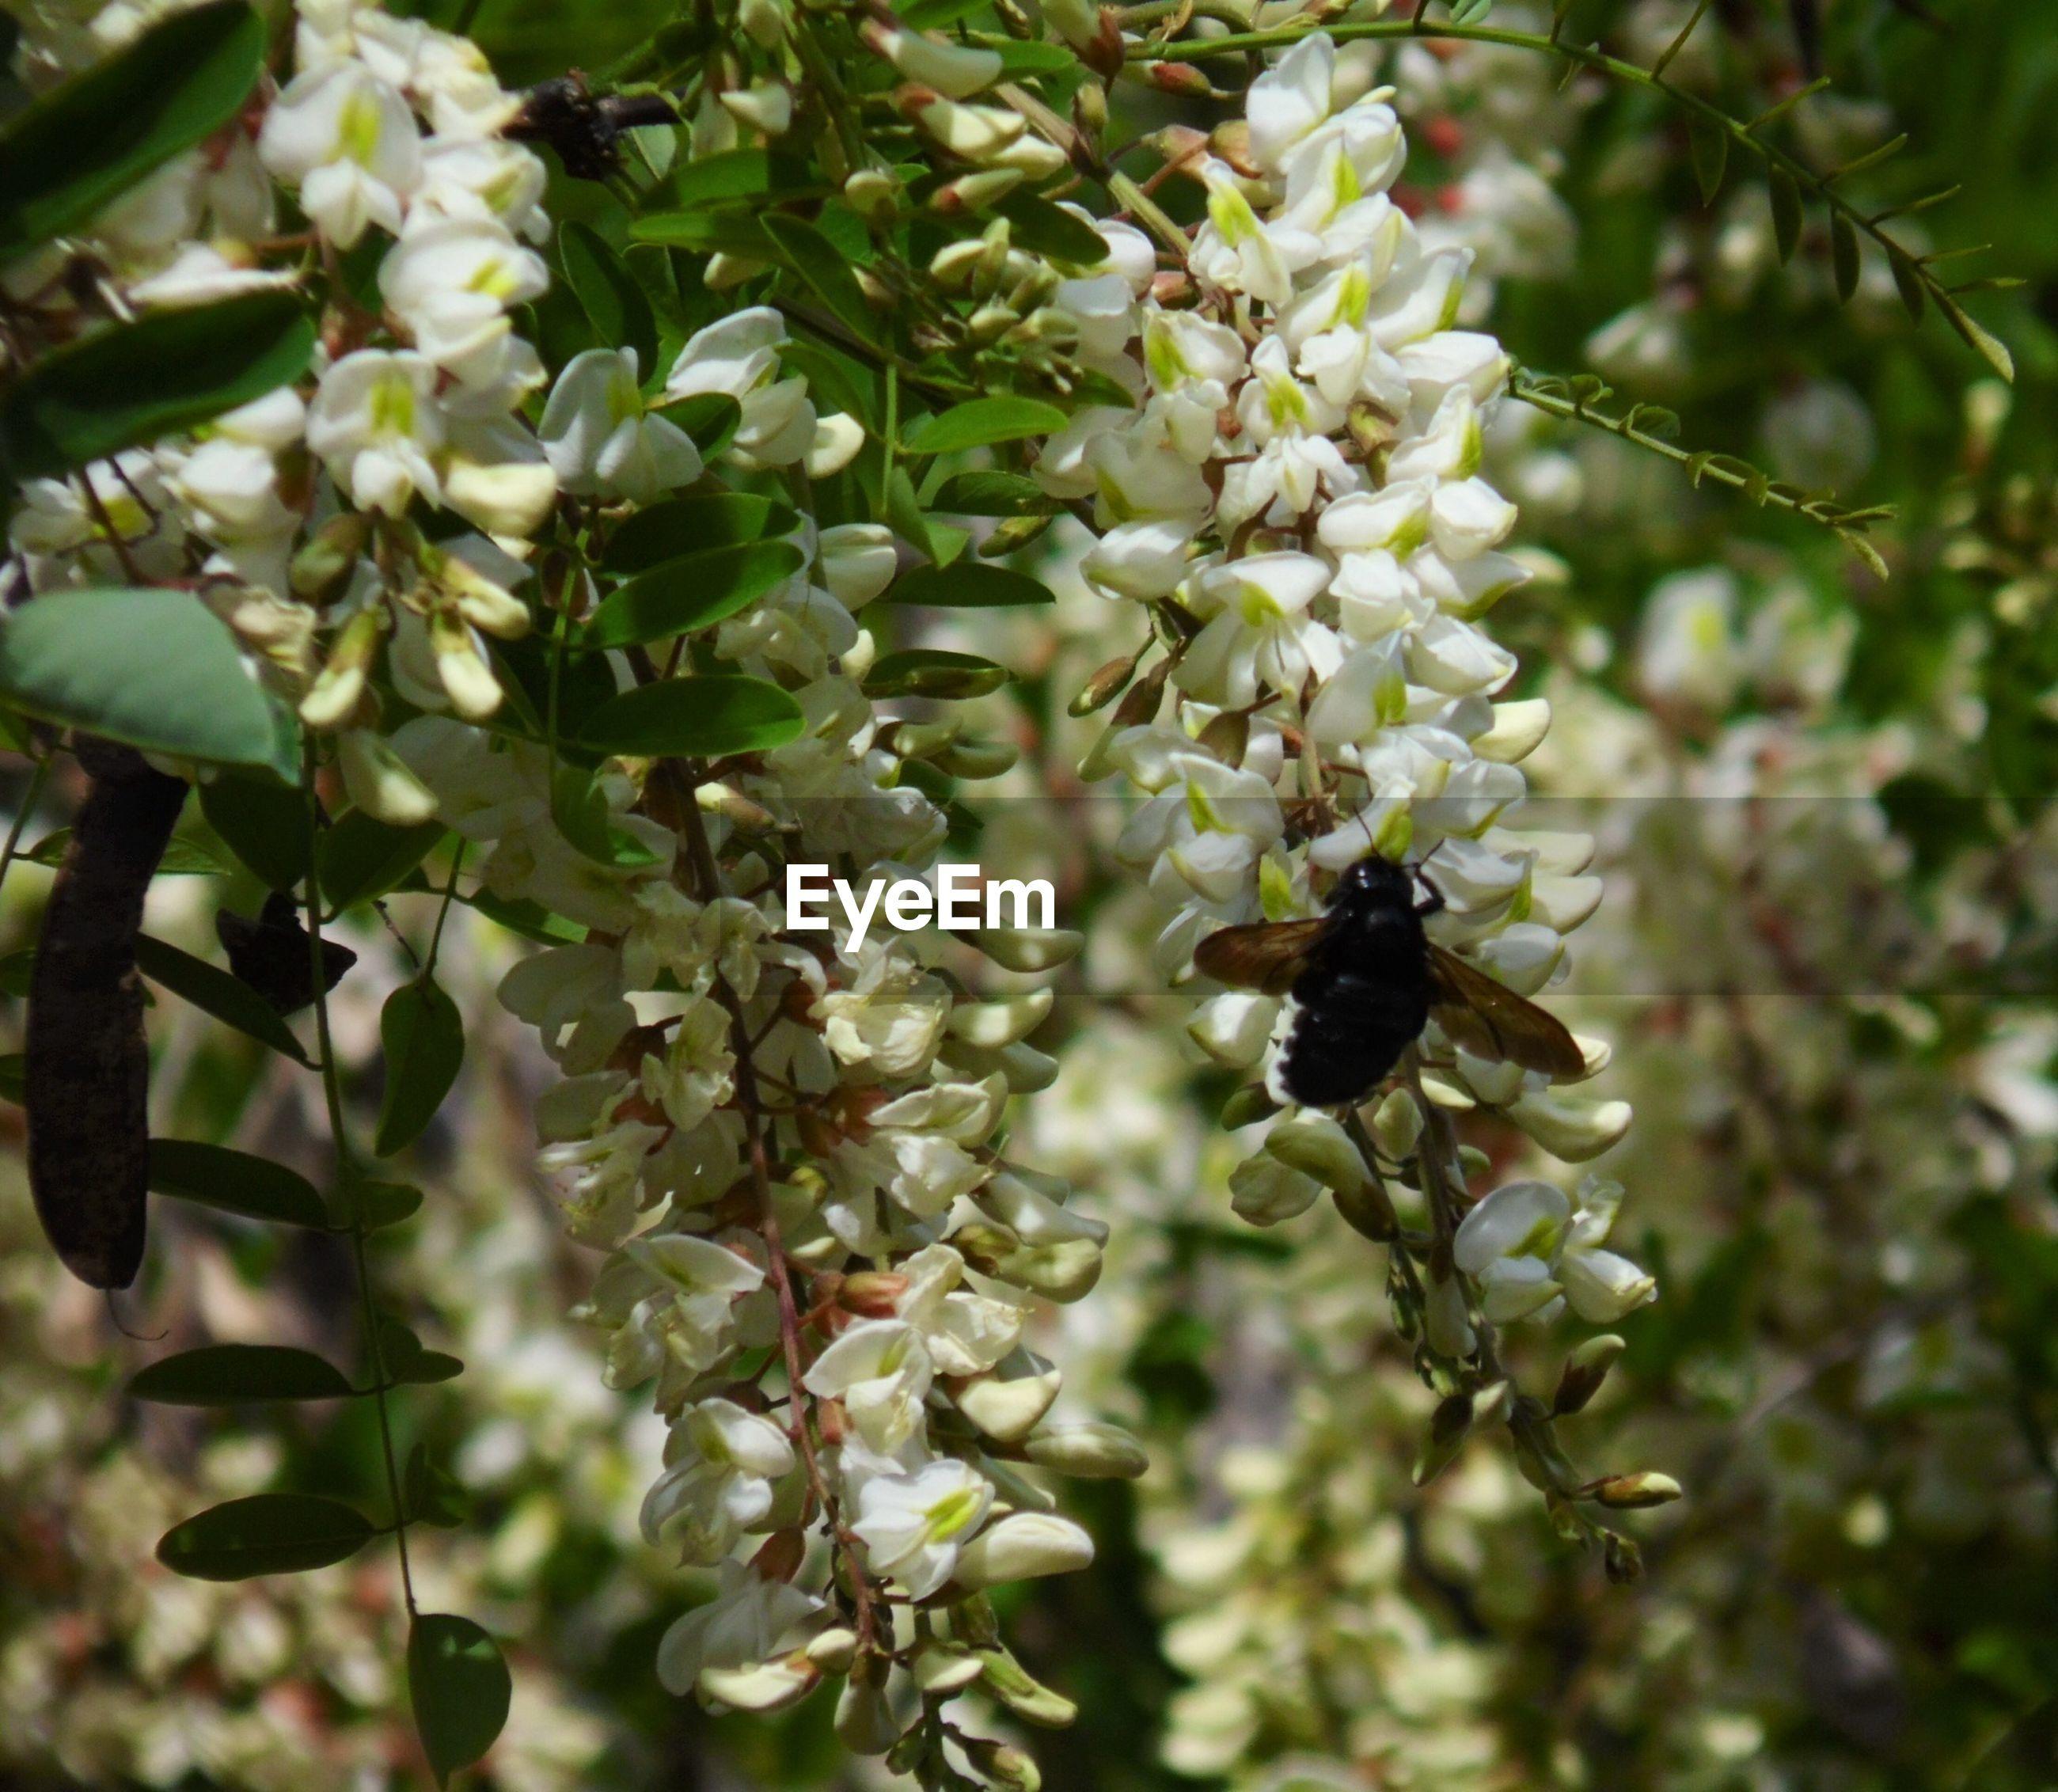 Honey bee pollinating flowers